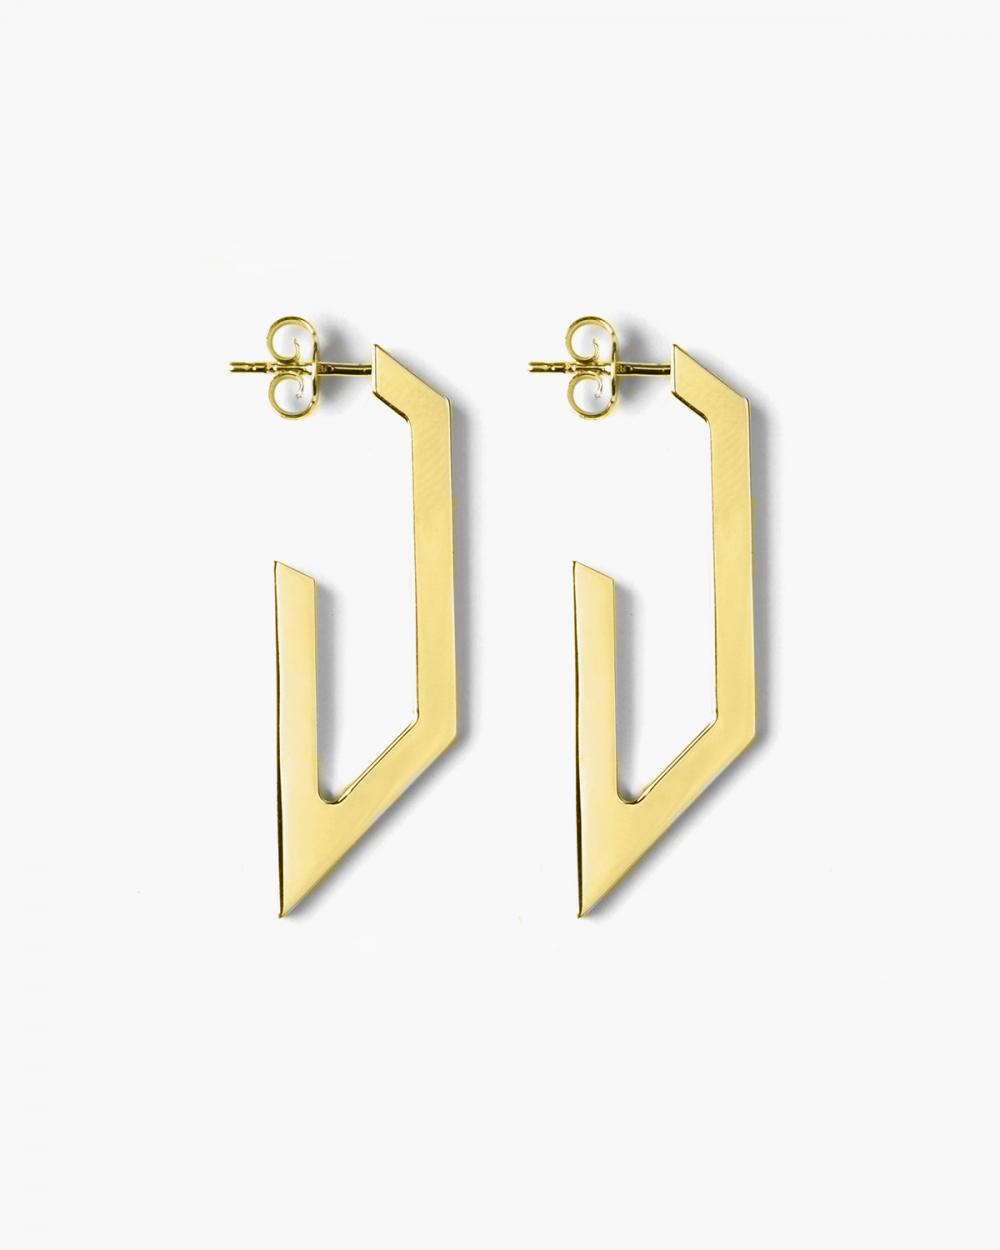 Earrings YELLOW GOLD TRAPEZE PLATE BIG EARRINGS NOVE25